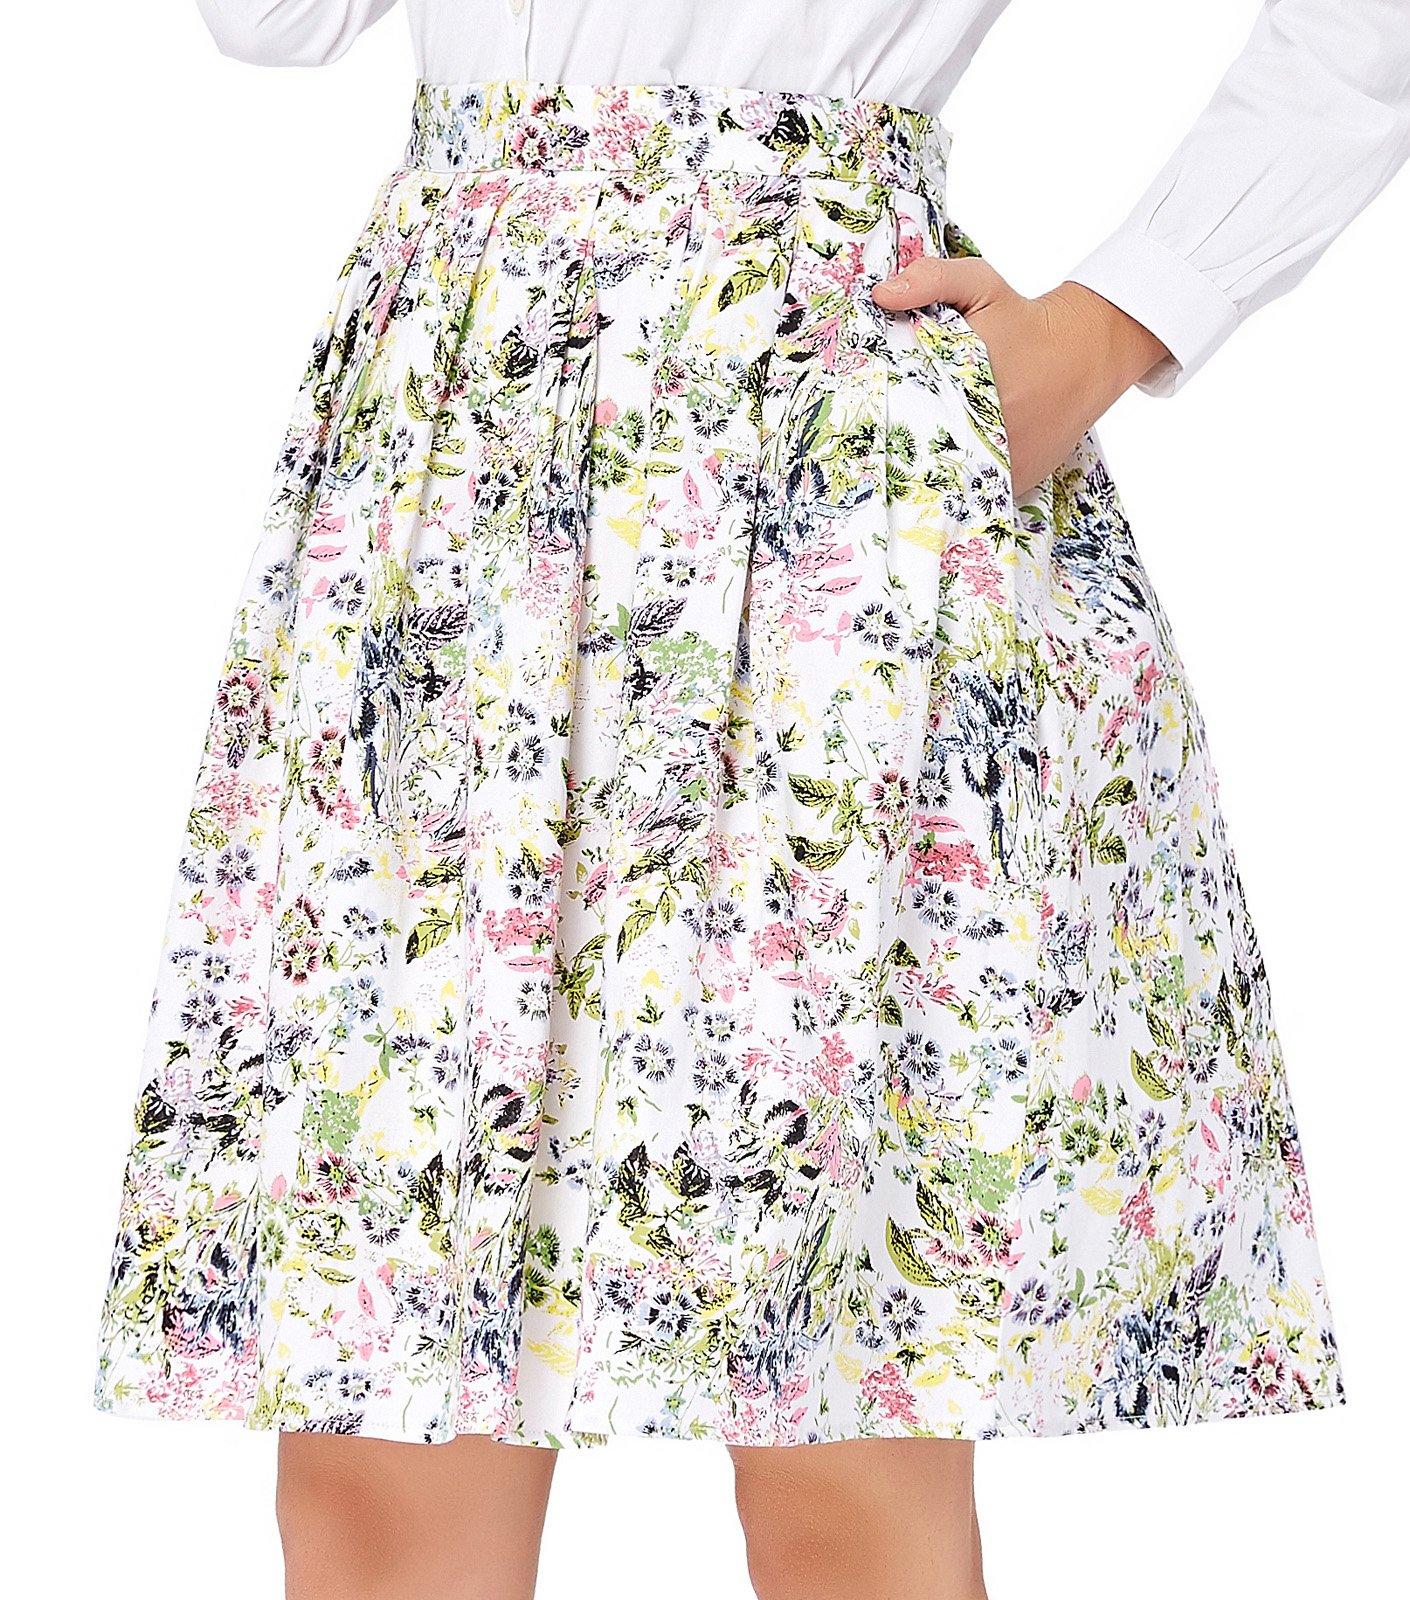 30b53f54f GRACE KARIN Women Retro Flared Skirts Classy Floral Printed Size L CL6294-18